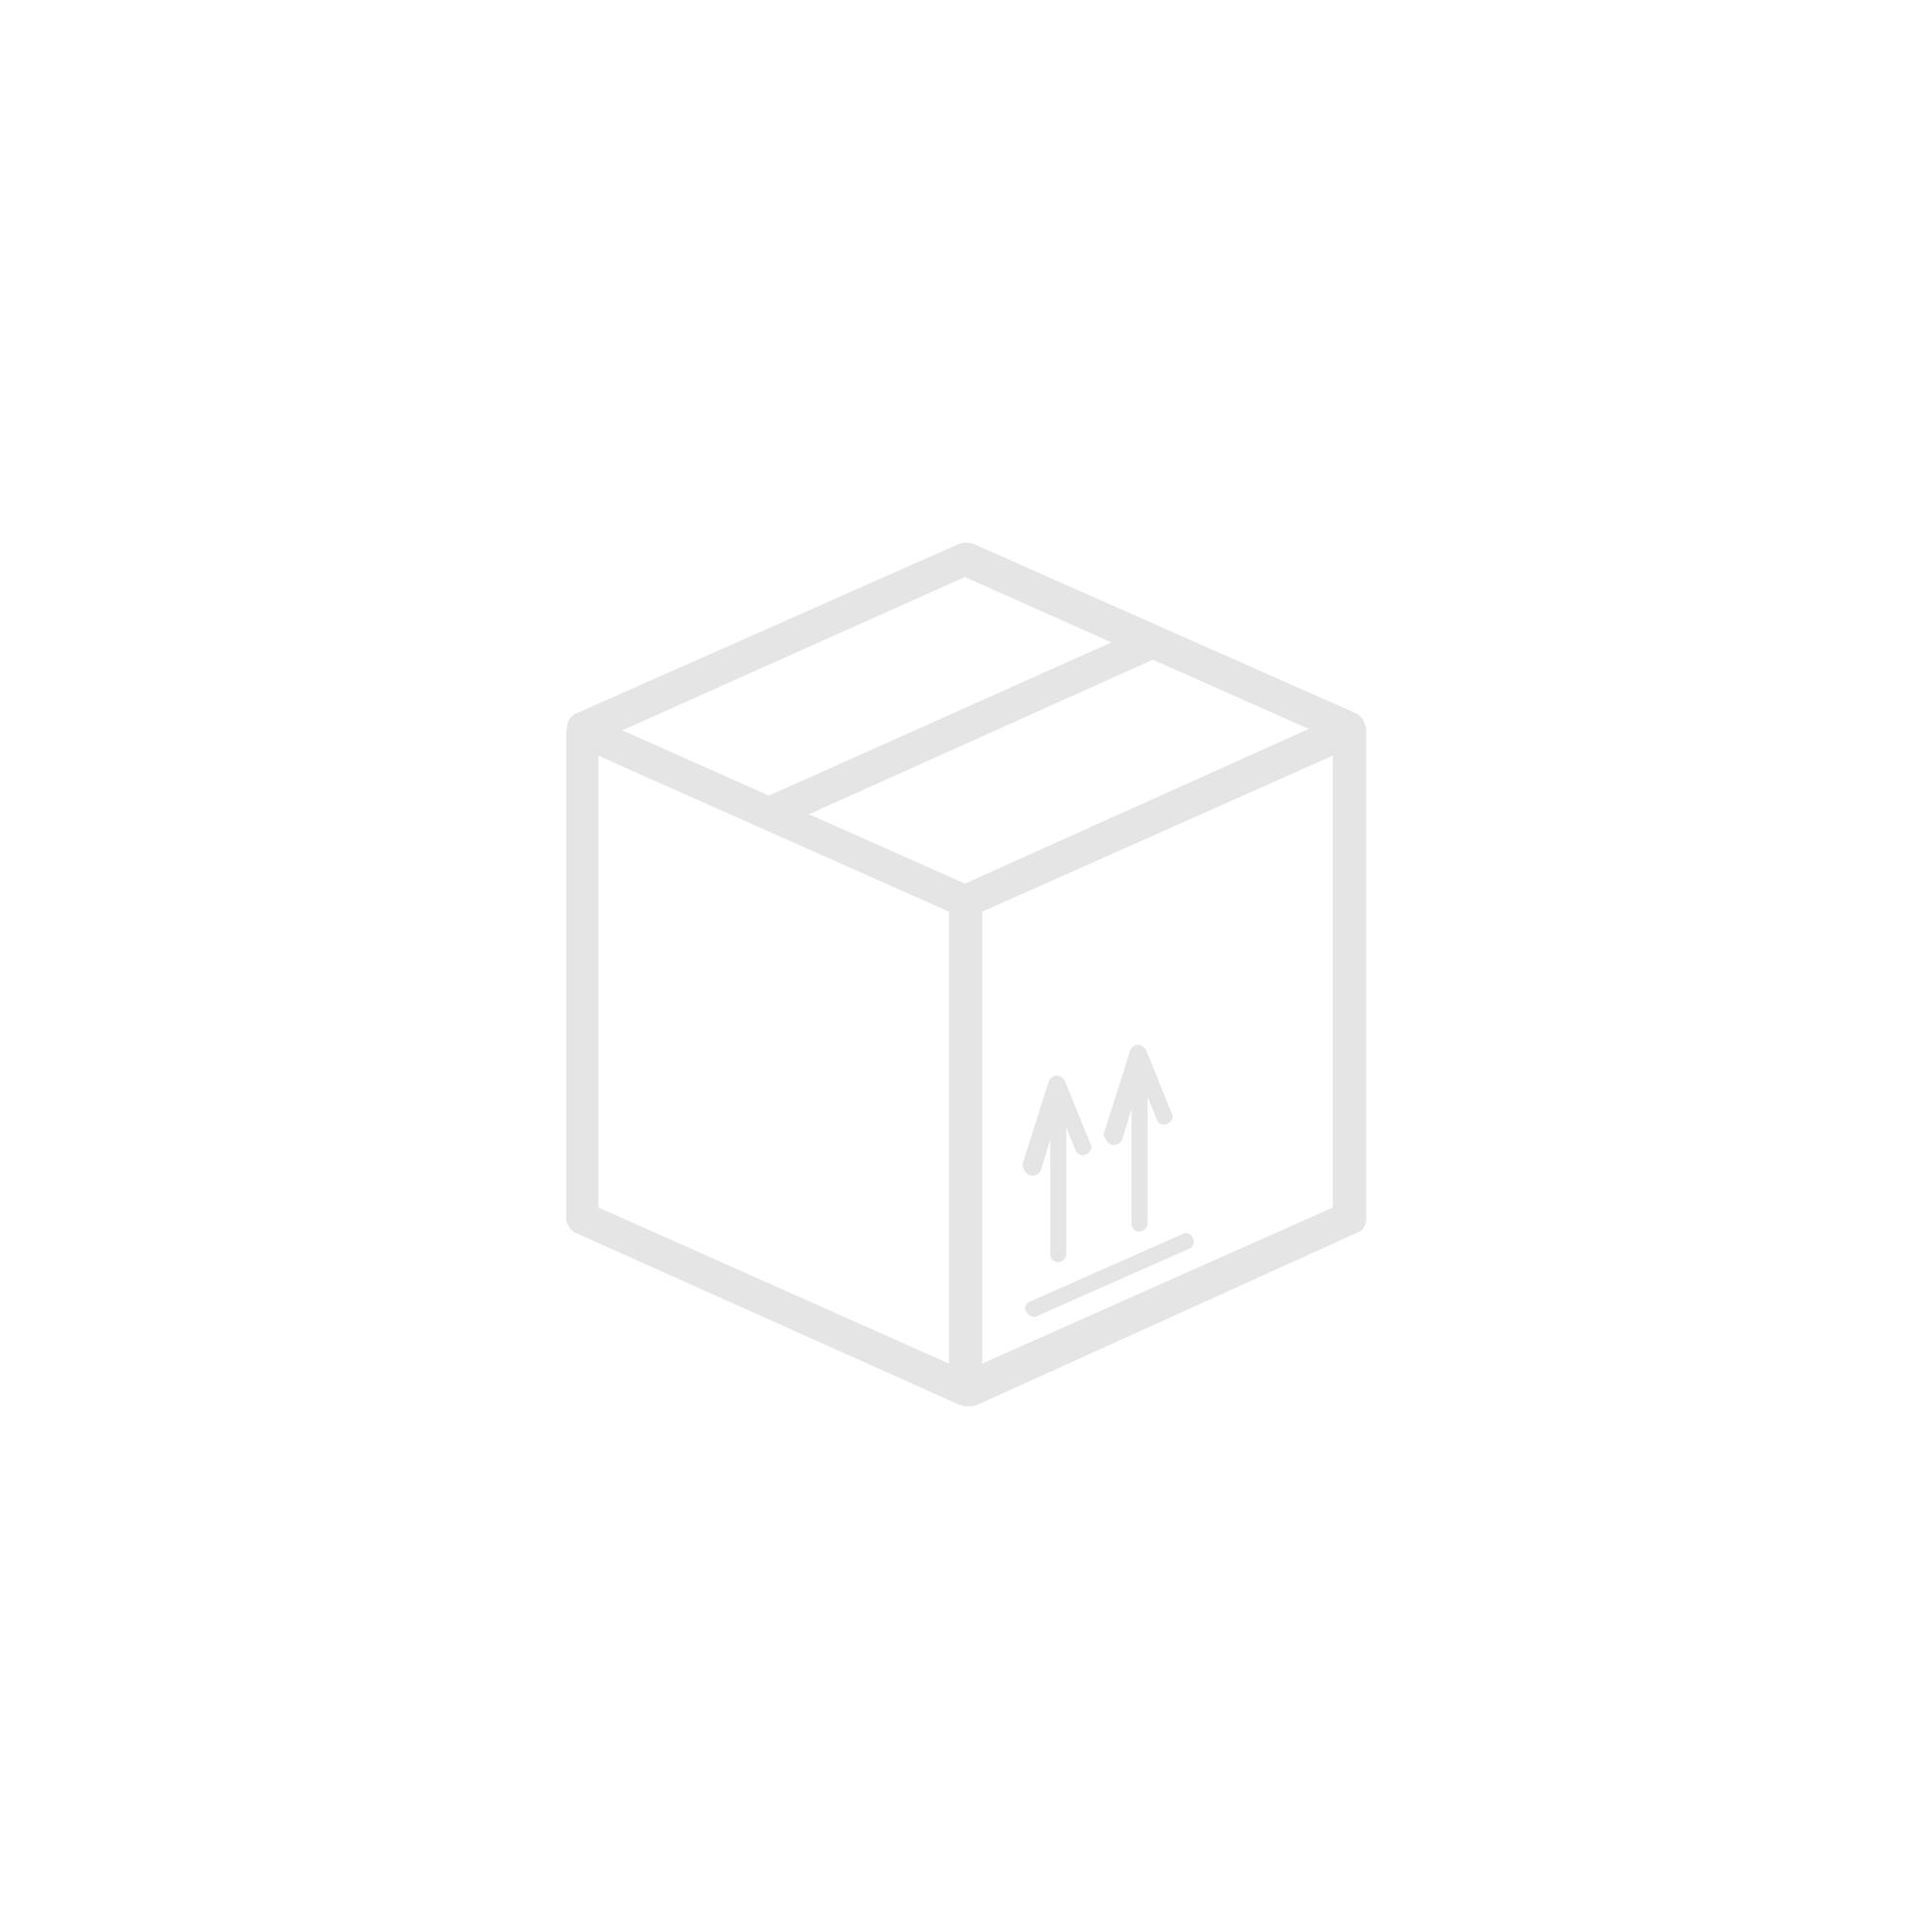 DISANO Svítidlo LED MICRORODIO 1982 28W 3118lm 4000K grafit IP66